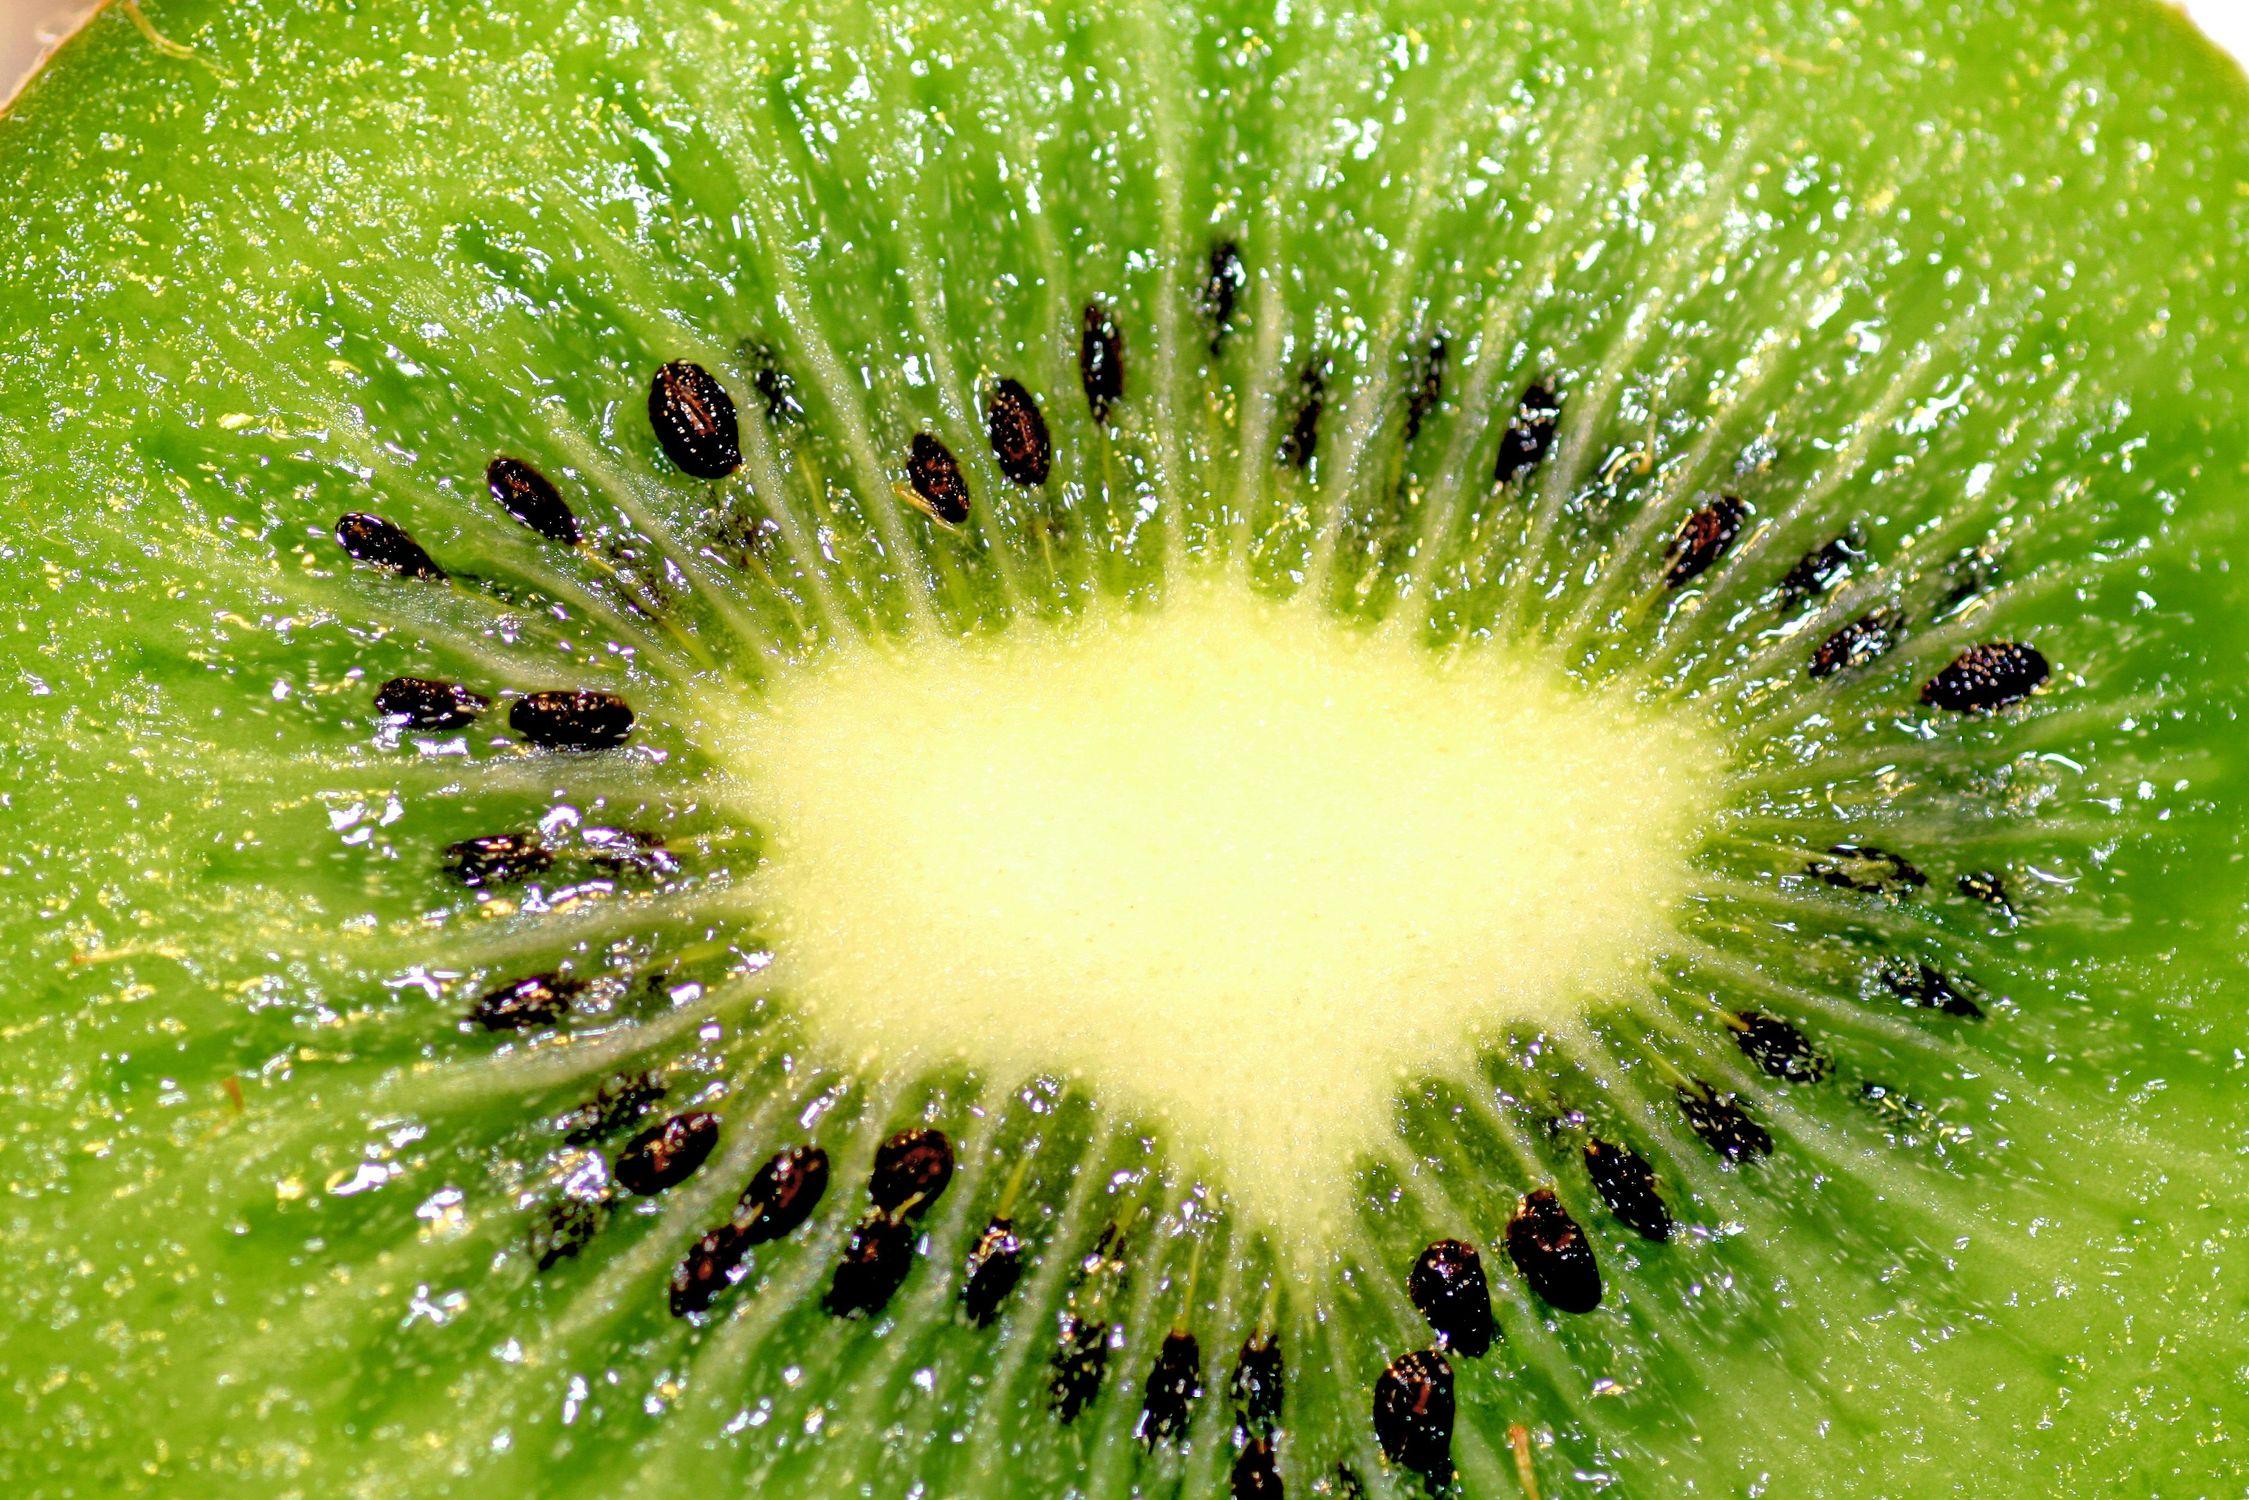 Bild mit Früchte, Lebensmittel, Frucht, Fruit, Fruits, Kiwi, Kiwies, Kiwifrucht